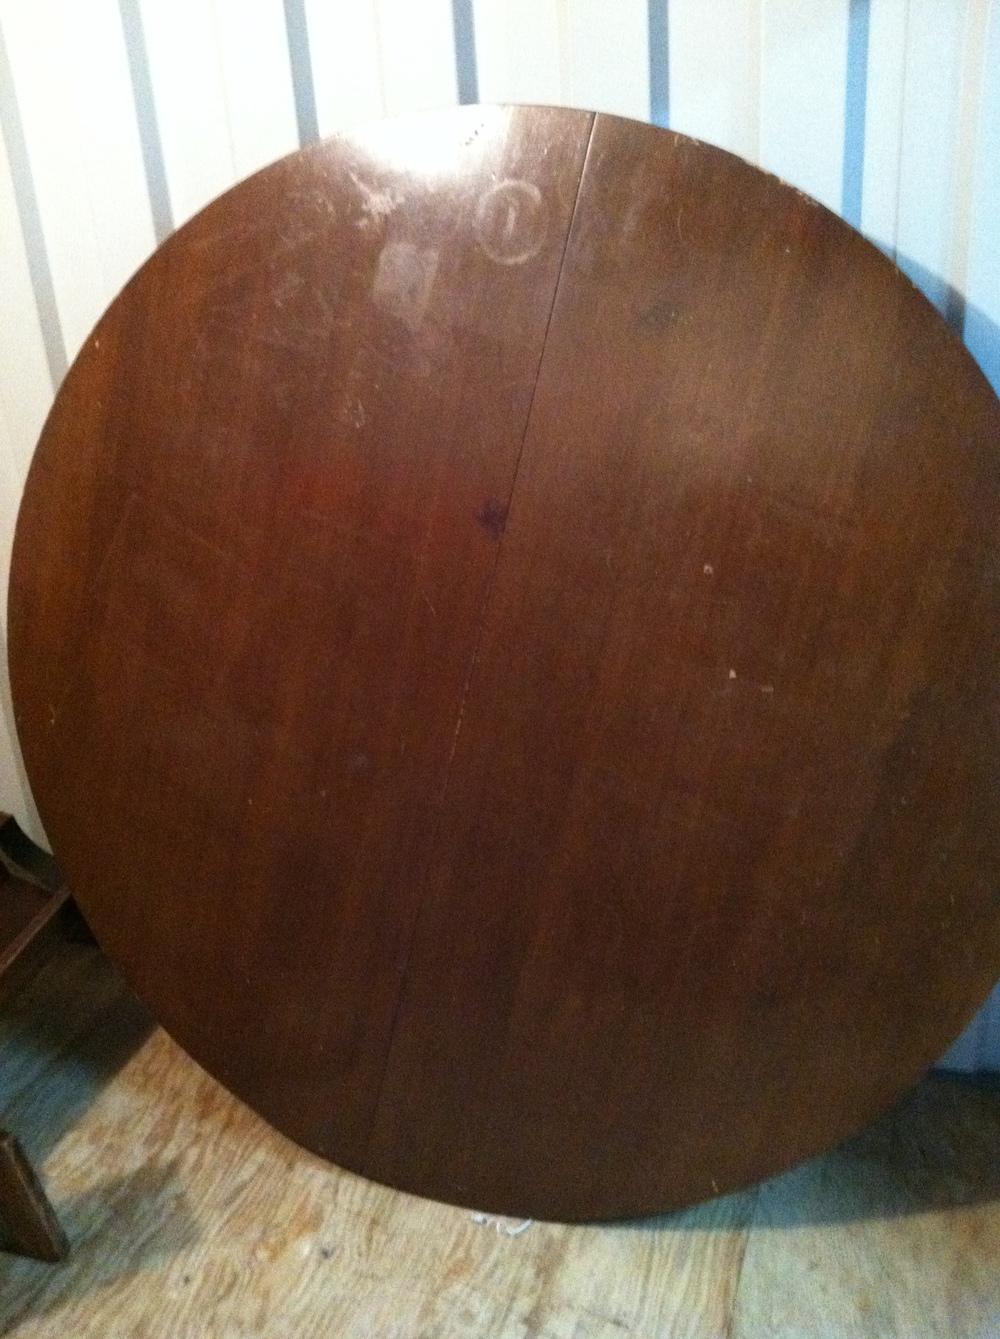 0458: Circular Wood Table Top